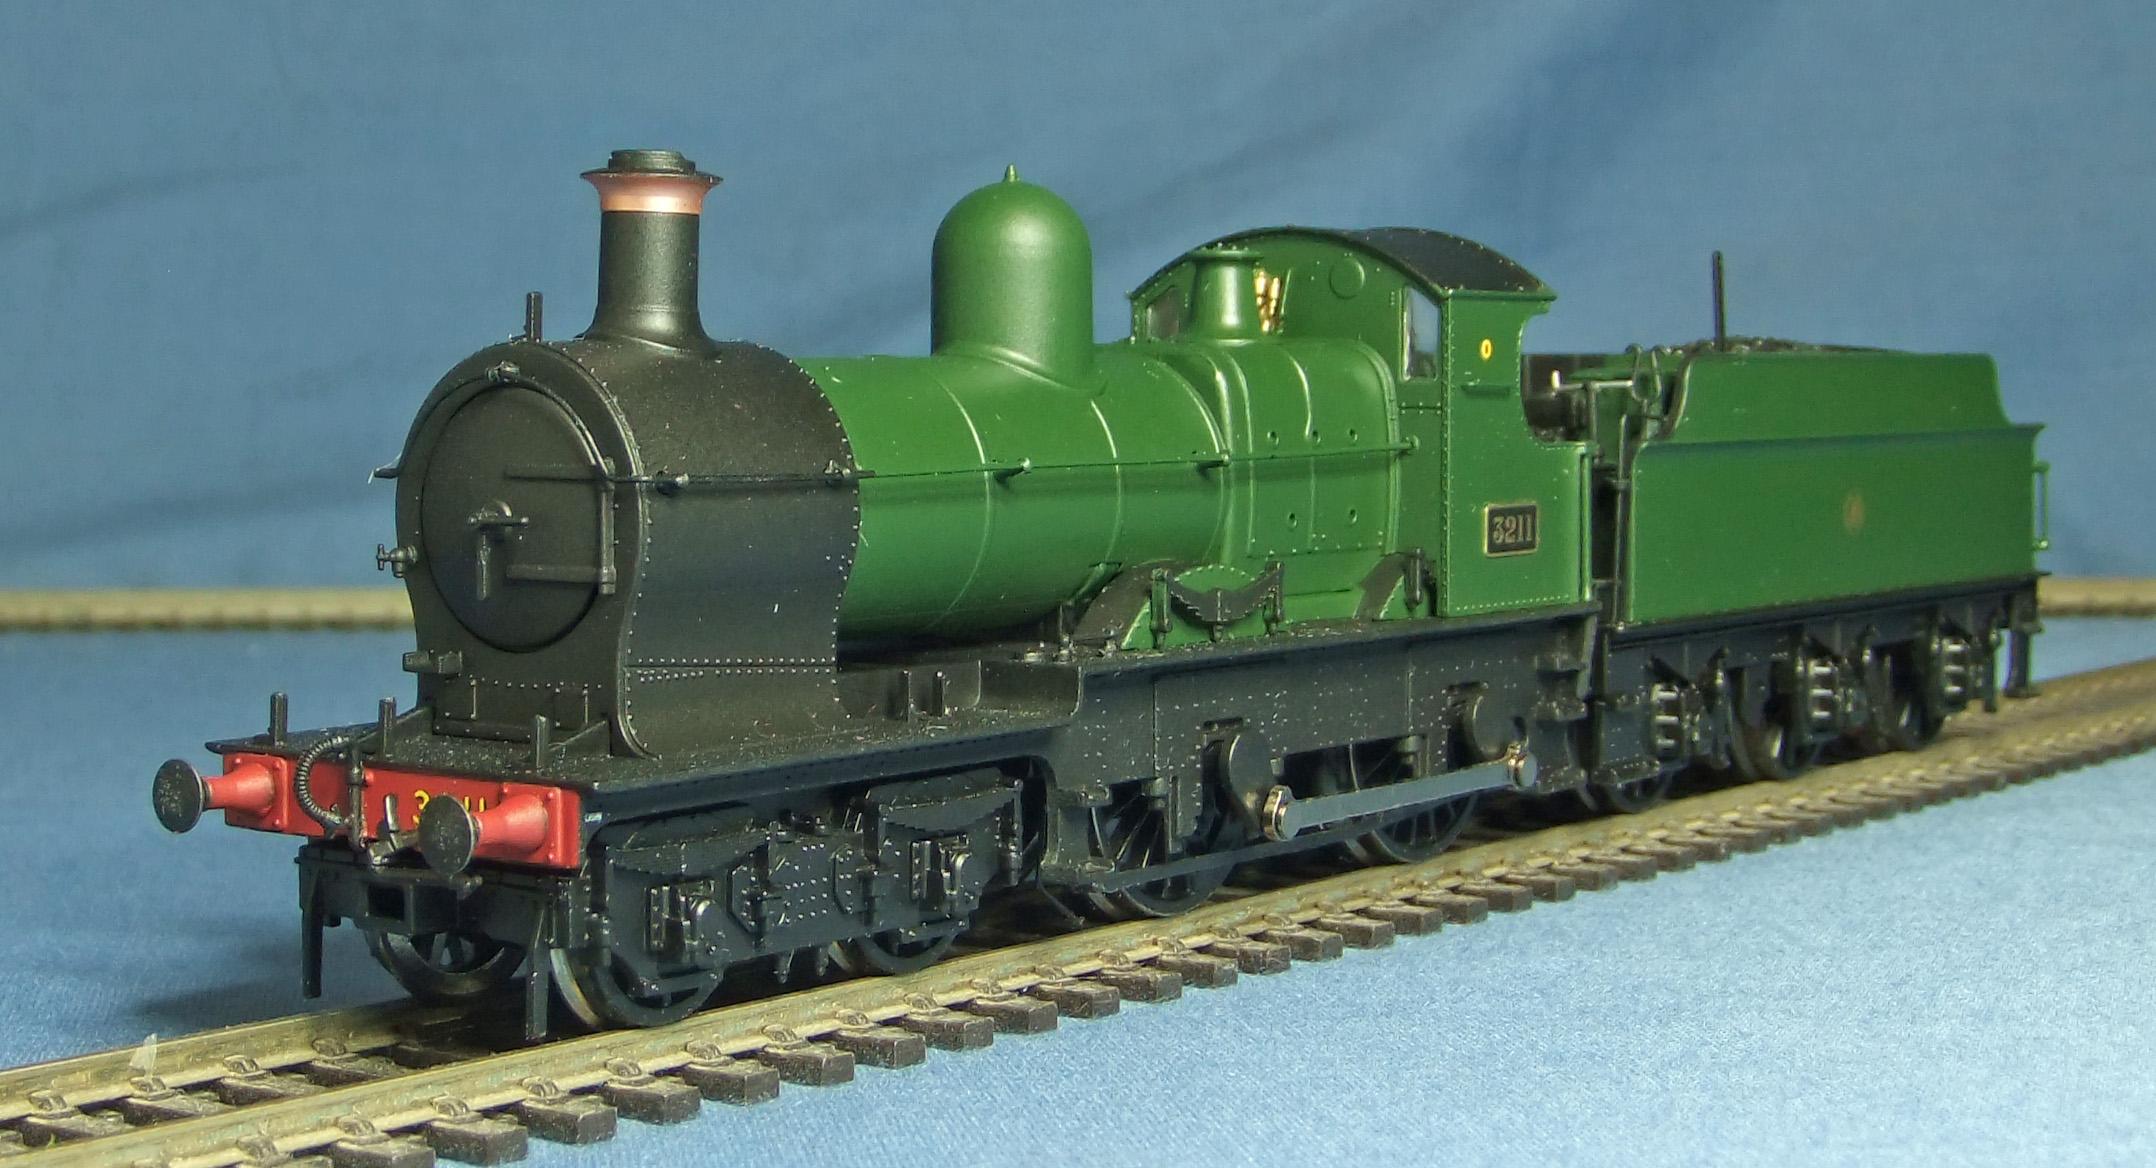 GWR Dukedog No.3211 - 1